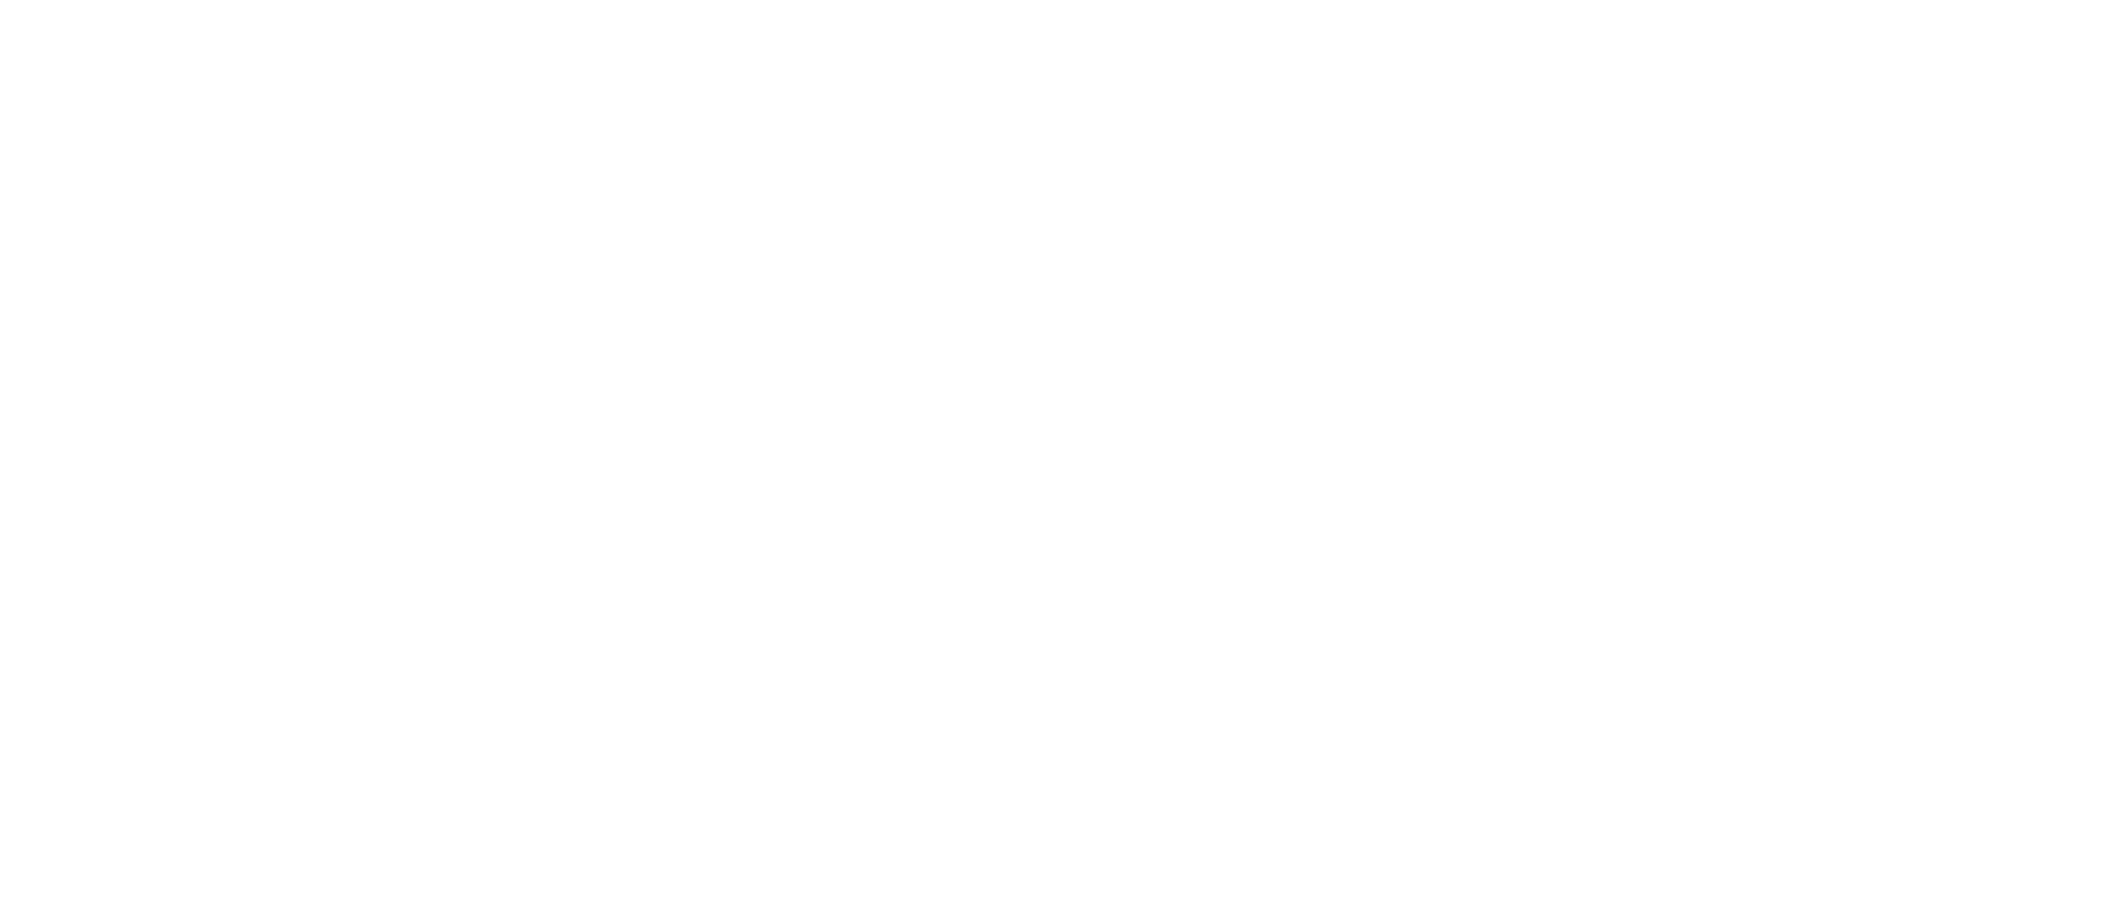 HANNAH TOLDT PHOTOGRAPHY